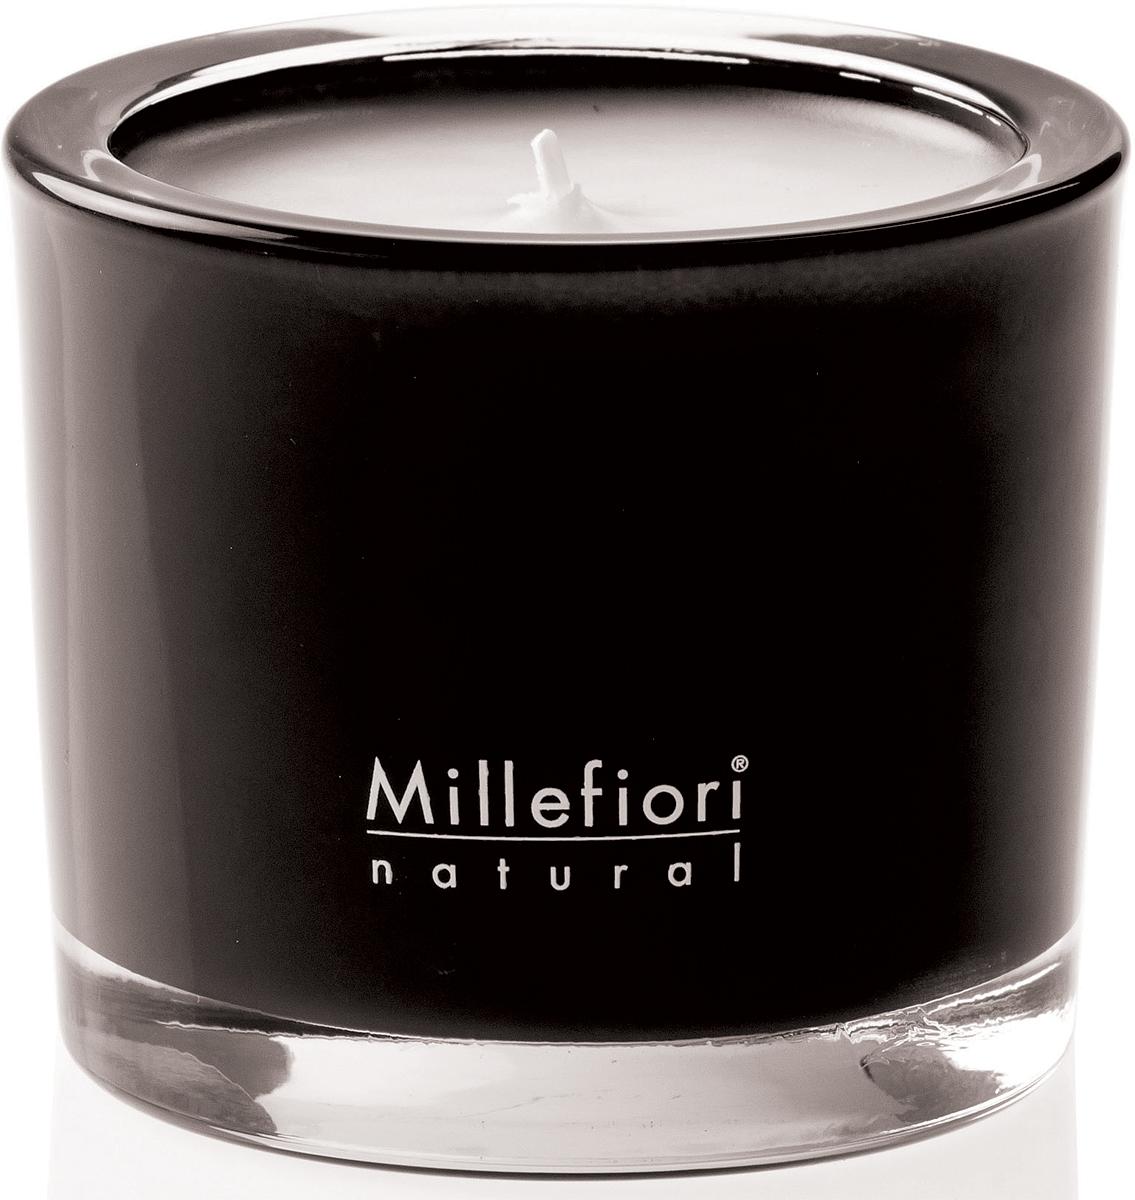 Cвеча ароматическая Millefiori Milano Черный / Nero, 180 г духи спрей для дома millefiori milano natural яблоко и корица mela